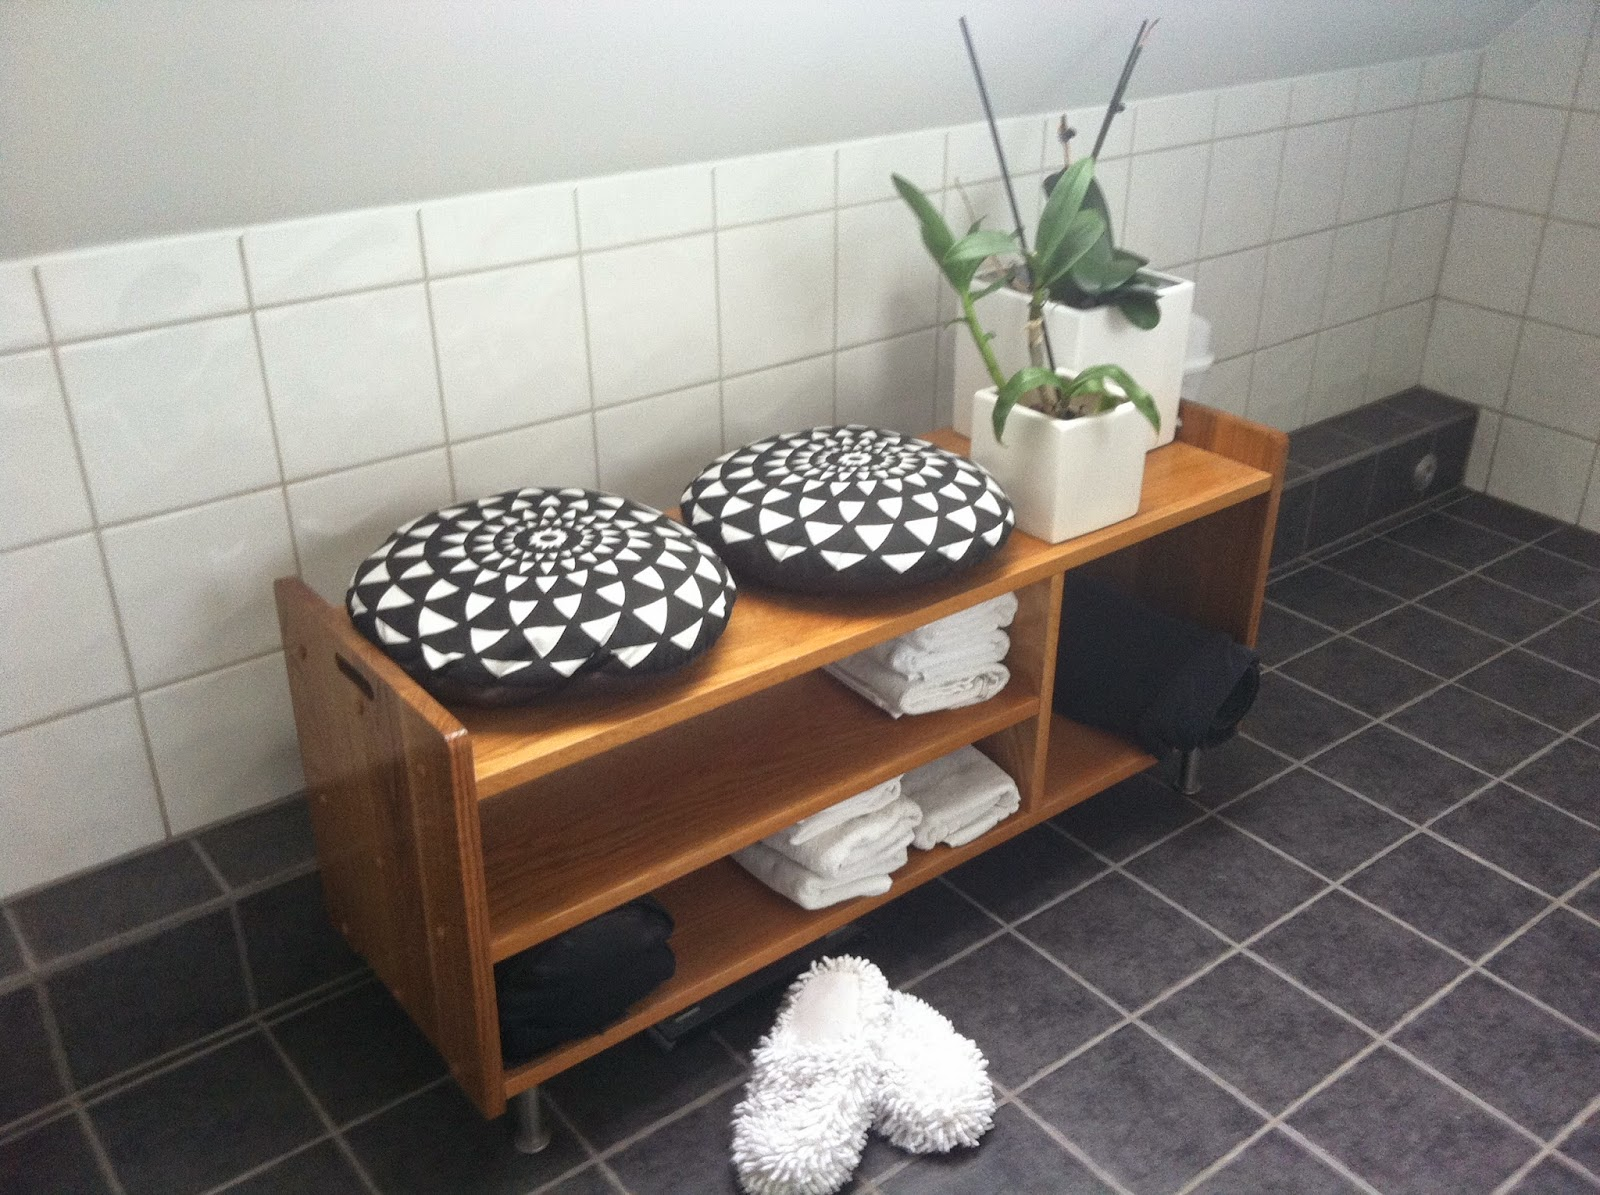 Mått sittbänk kök ~ zeedub.com